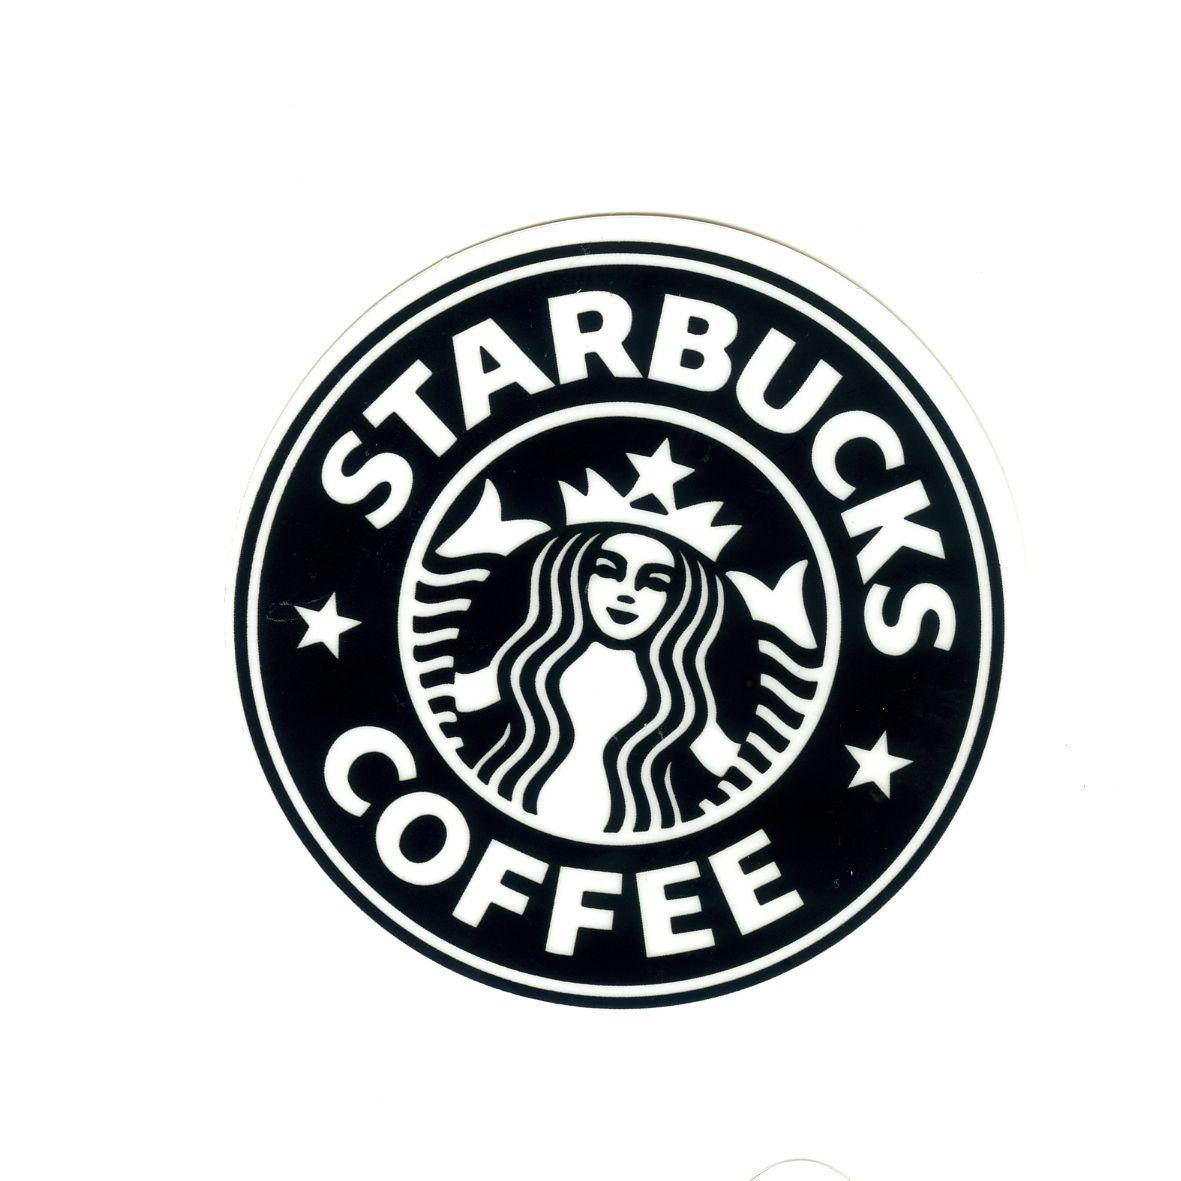 1349 Starbucks Black Special Logo Height 7 Cm Decal Sticker Decalstar Com Black And White Stickers Print Stickers White Stickers